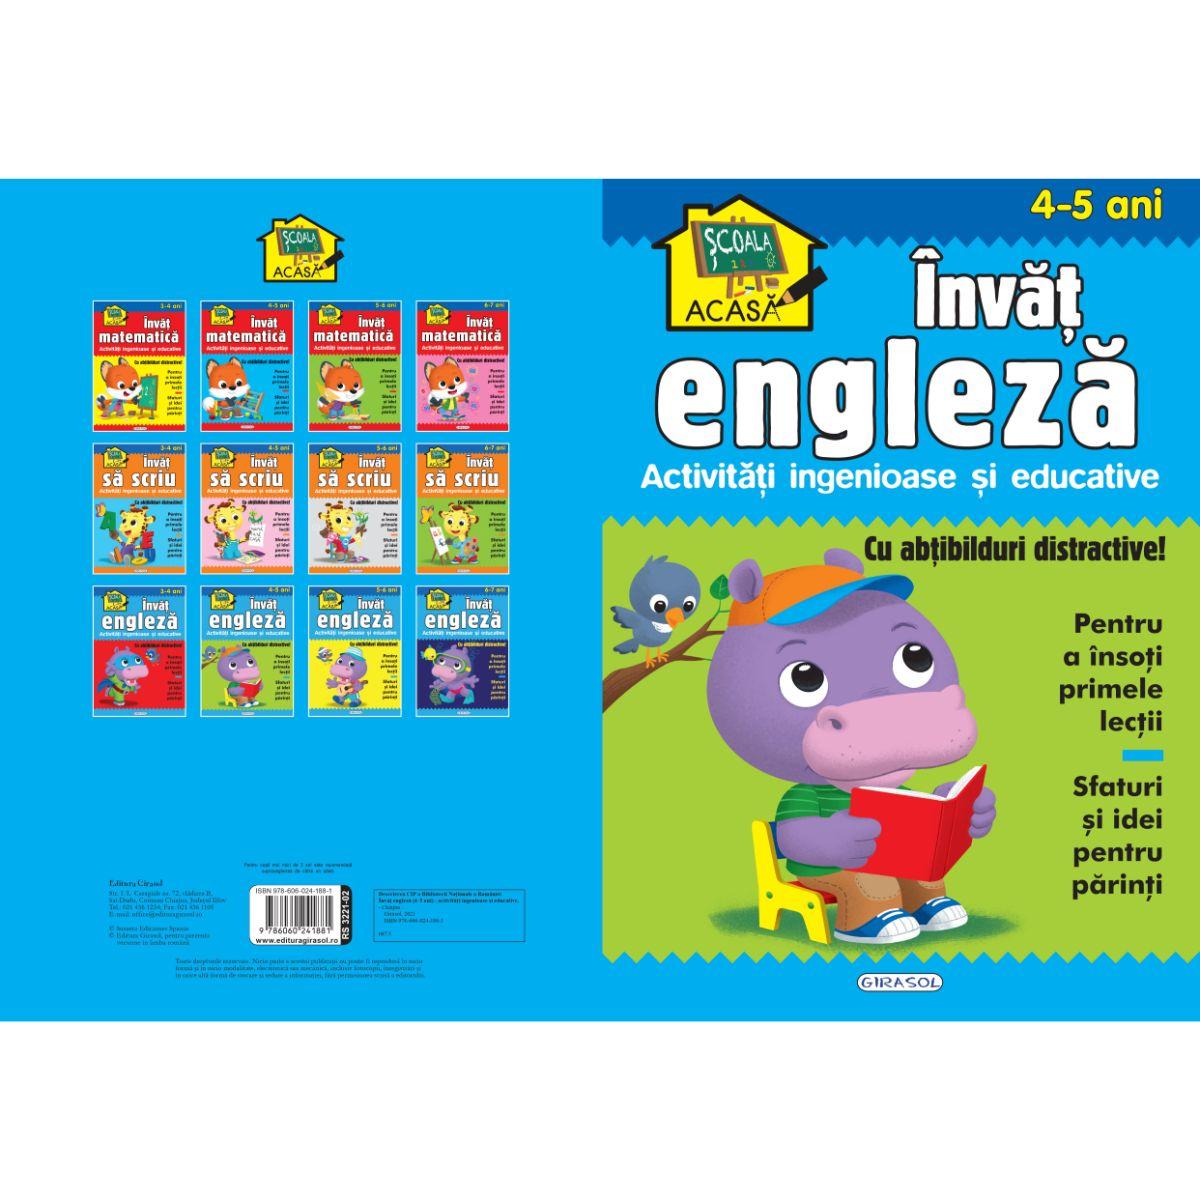 Scoala acasa, Invat engleza, 4-5 ani